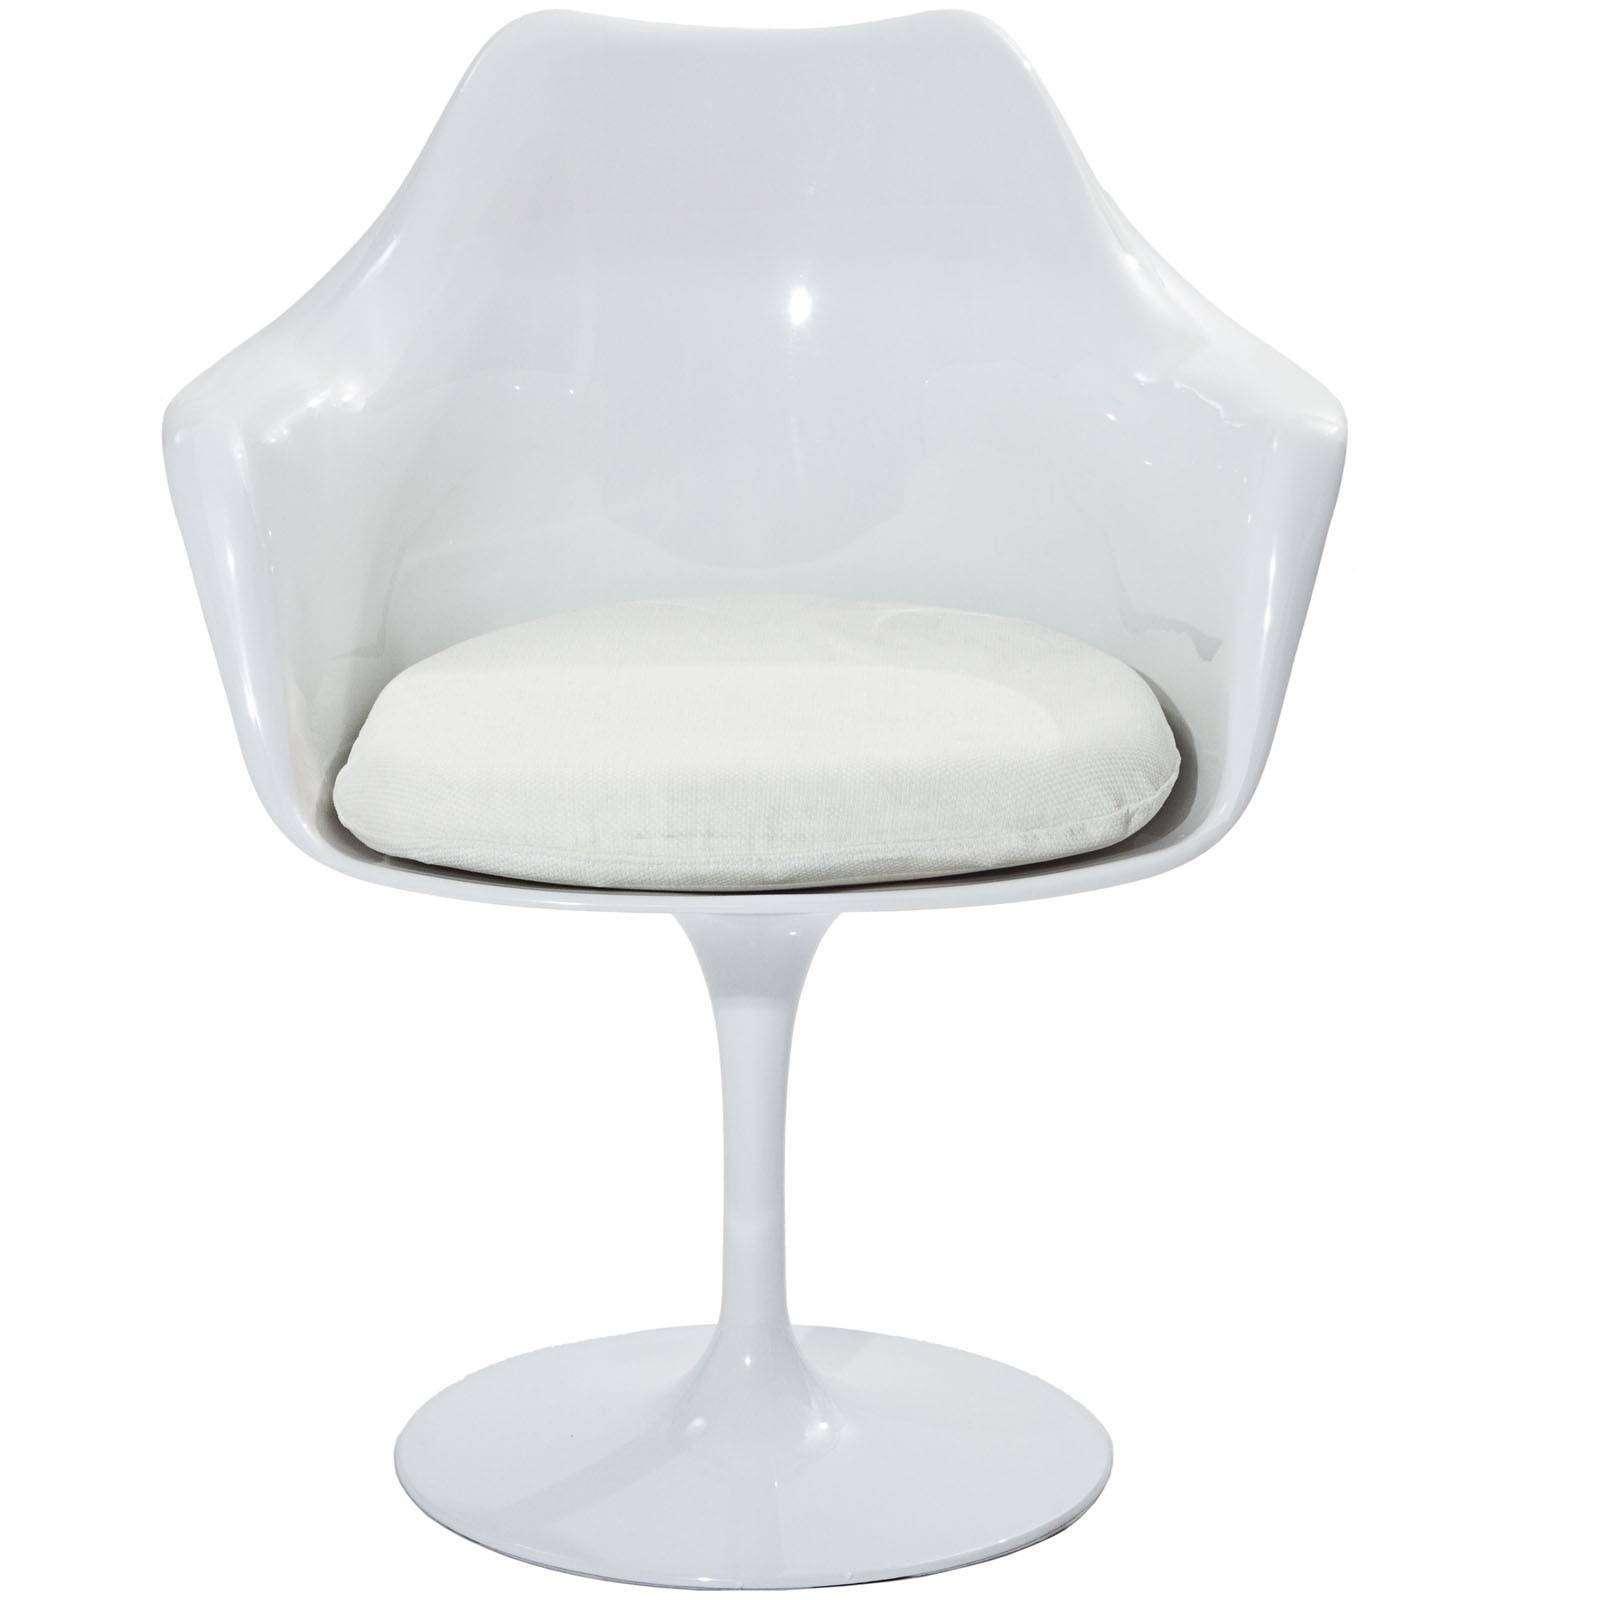 white chaise lounge chair razer gaming eero saarinen style tulip arm